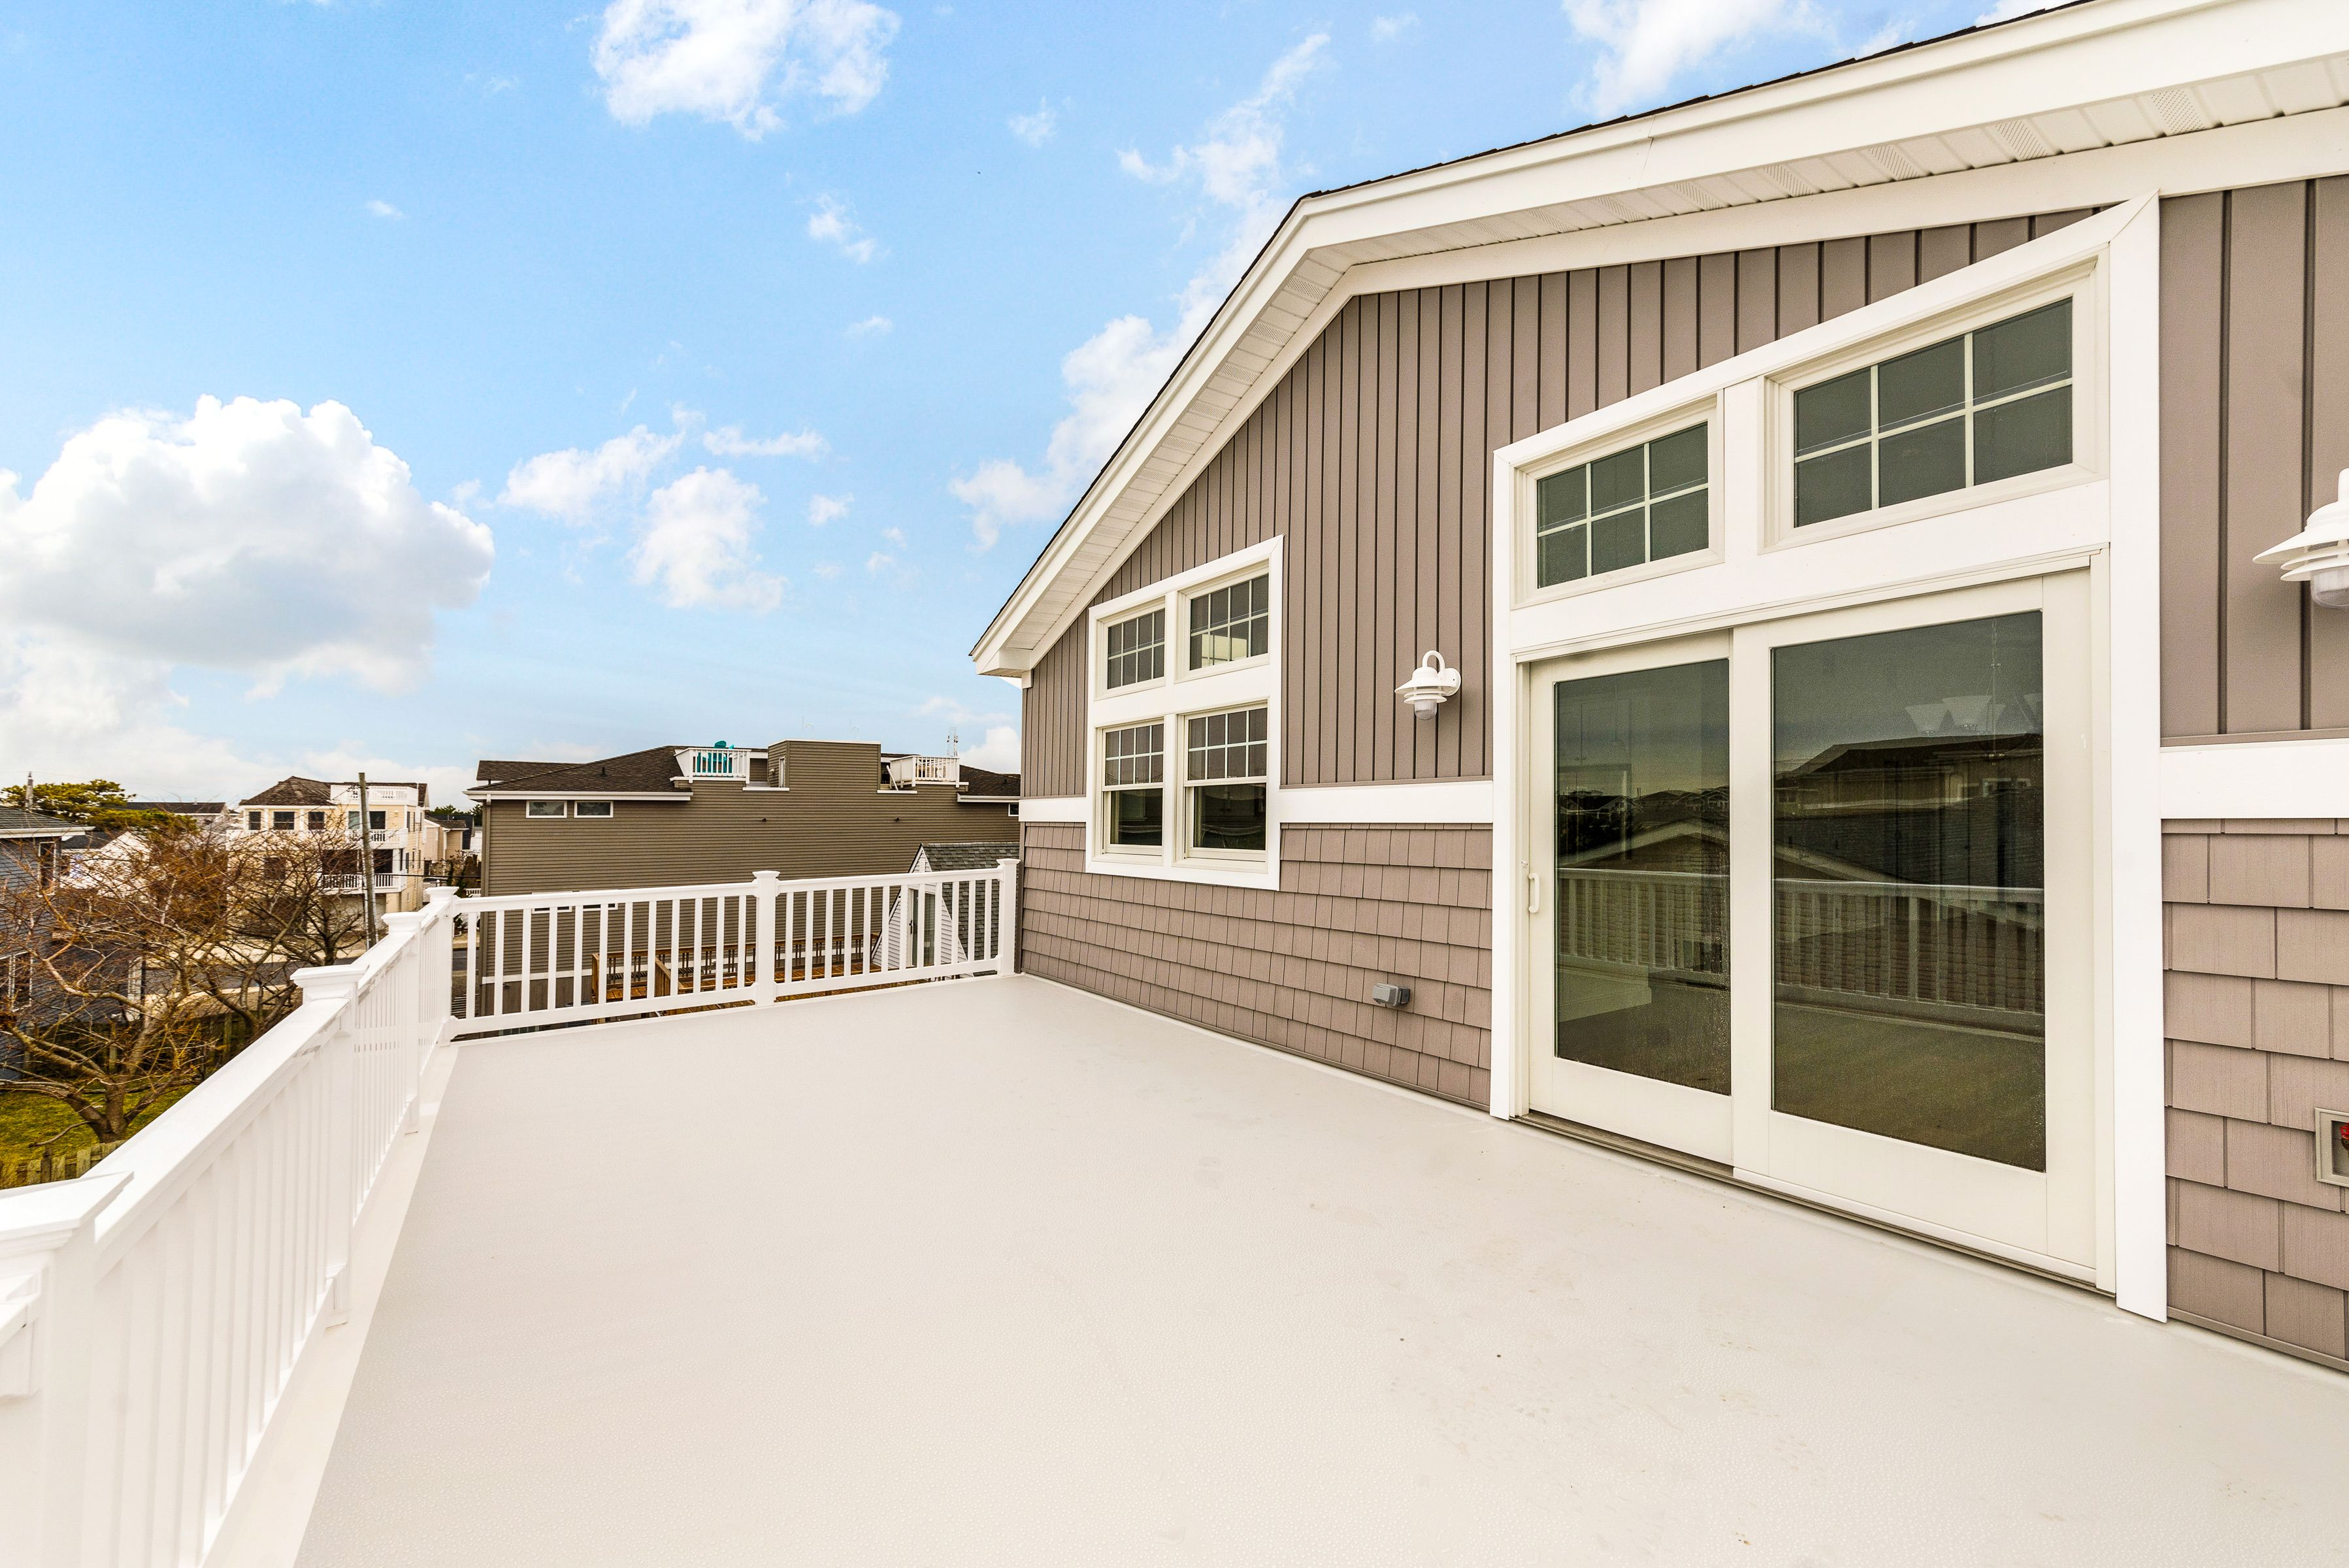 Nj New Jersey Bucks County Pa Real Estate Photography Real Estate Photography Long Beach Island Real Estate